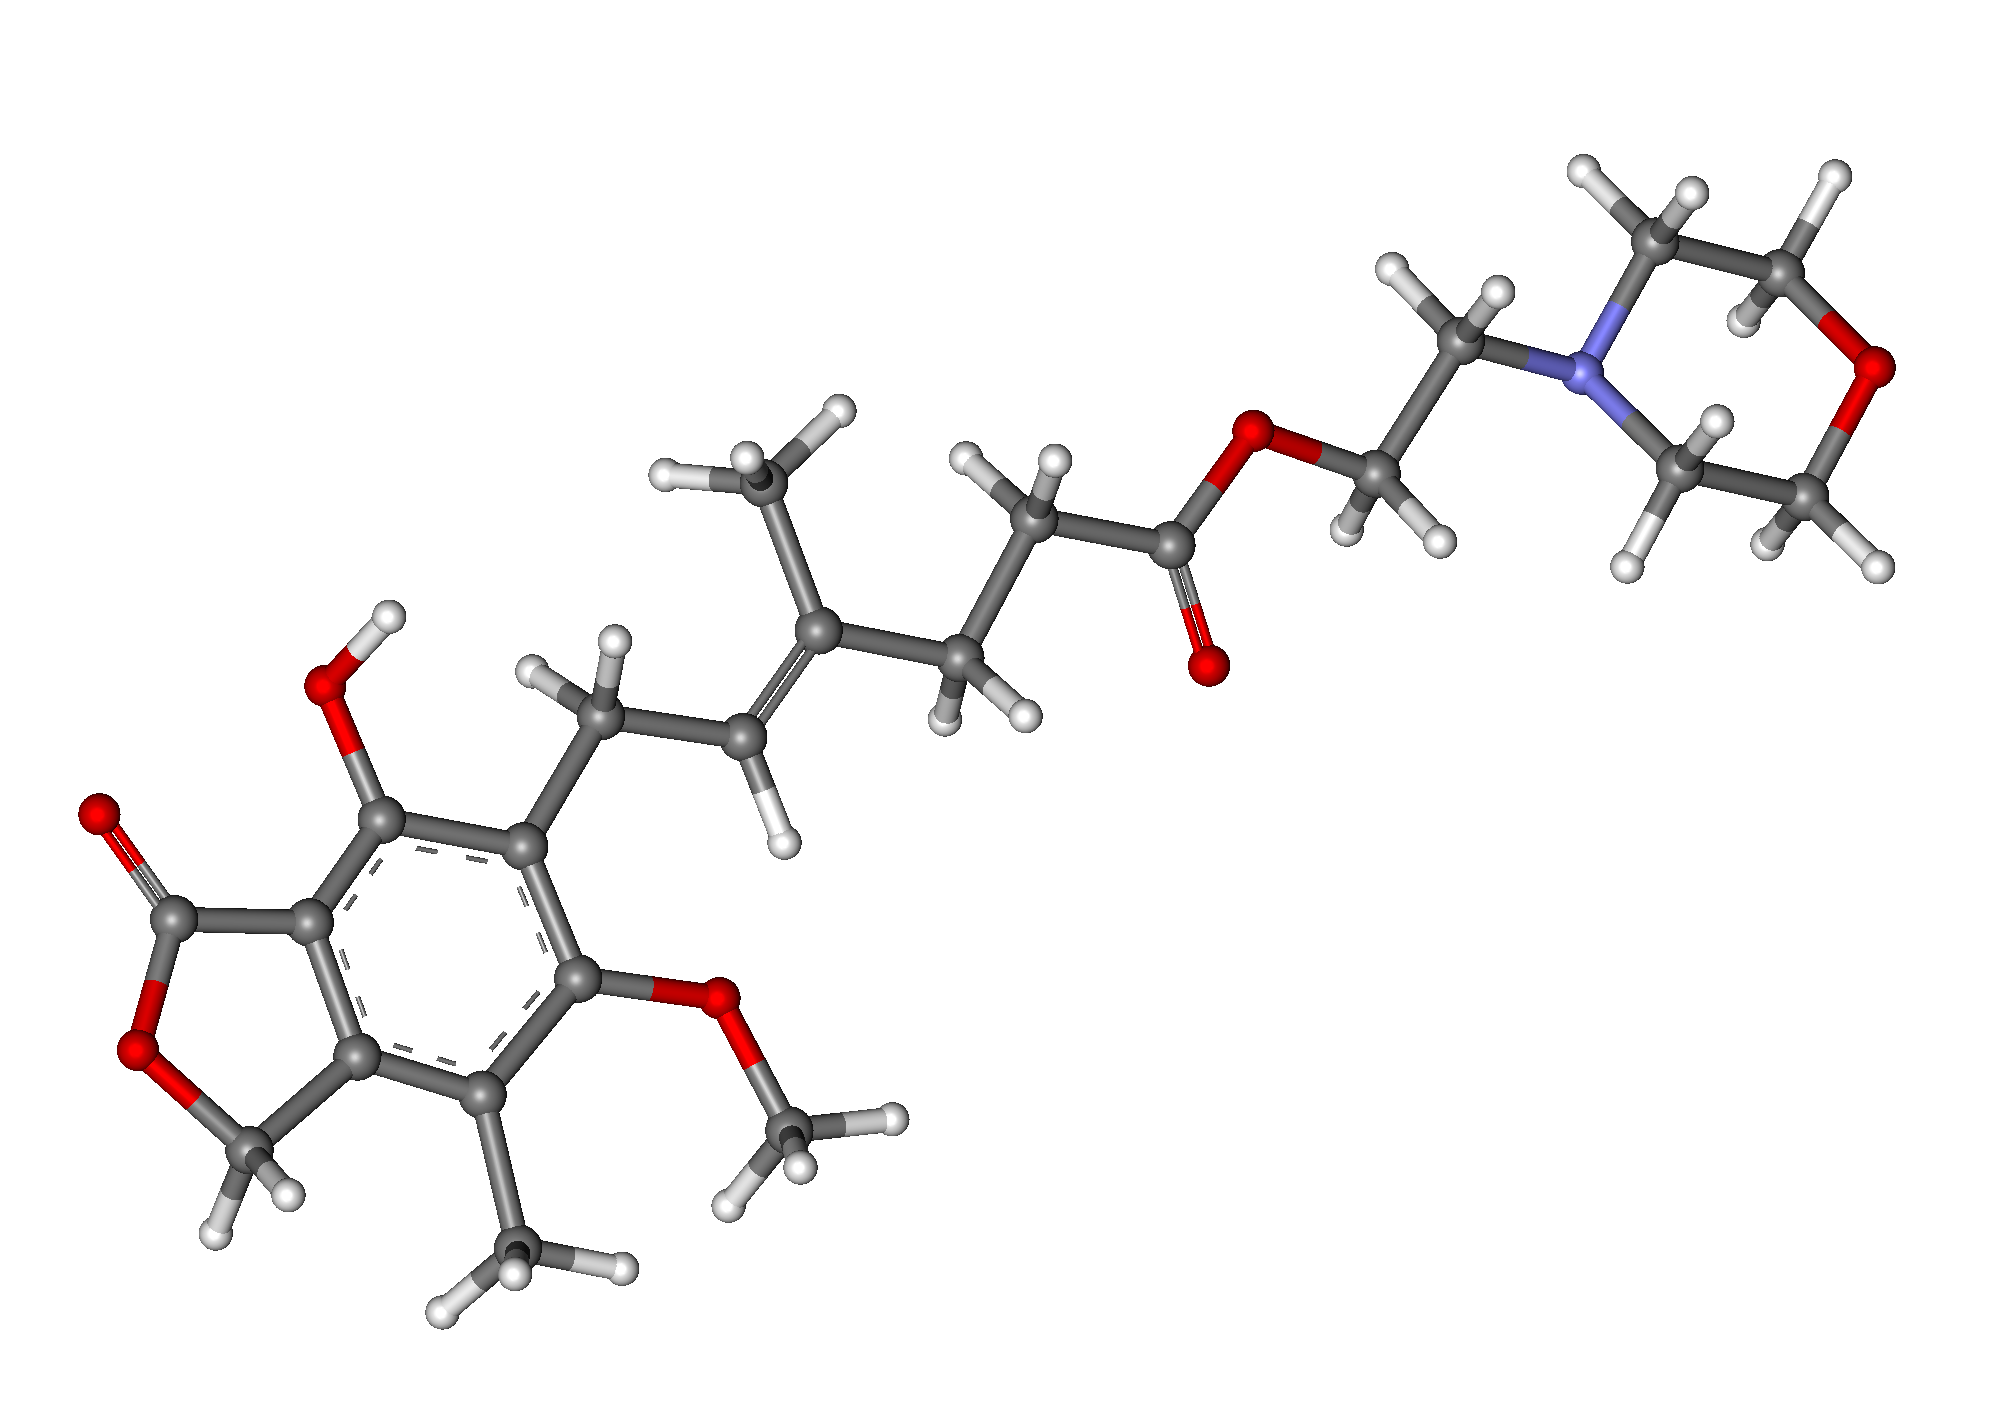 Mycophenolate Mofetil (Oral Route) Description and Brand ...